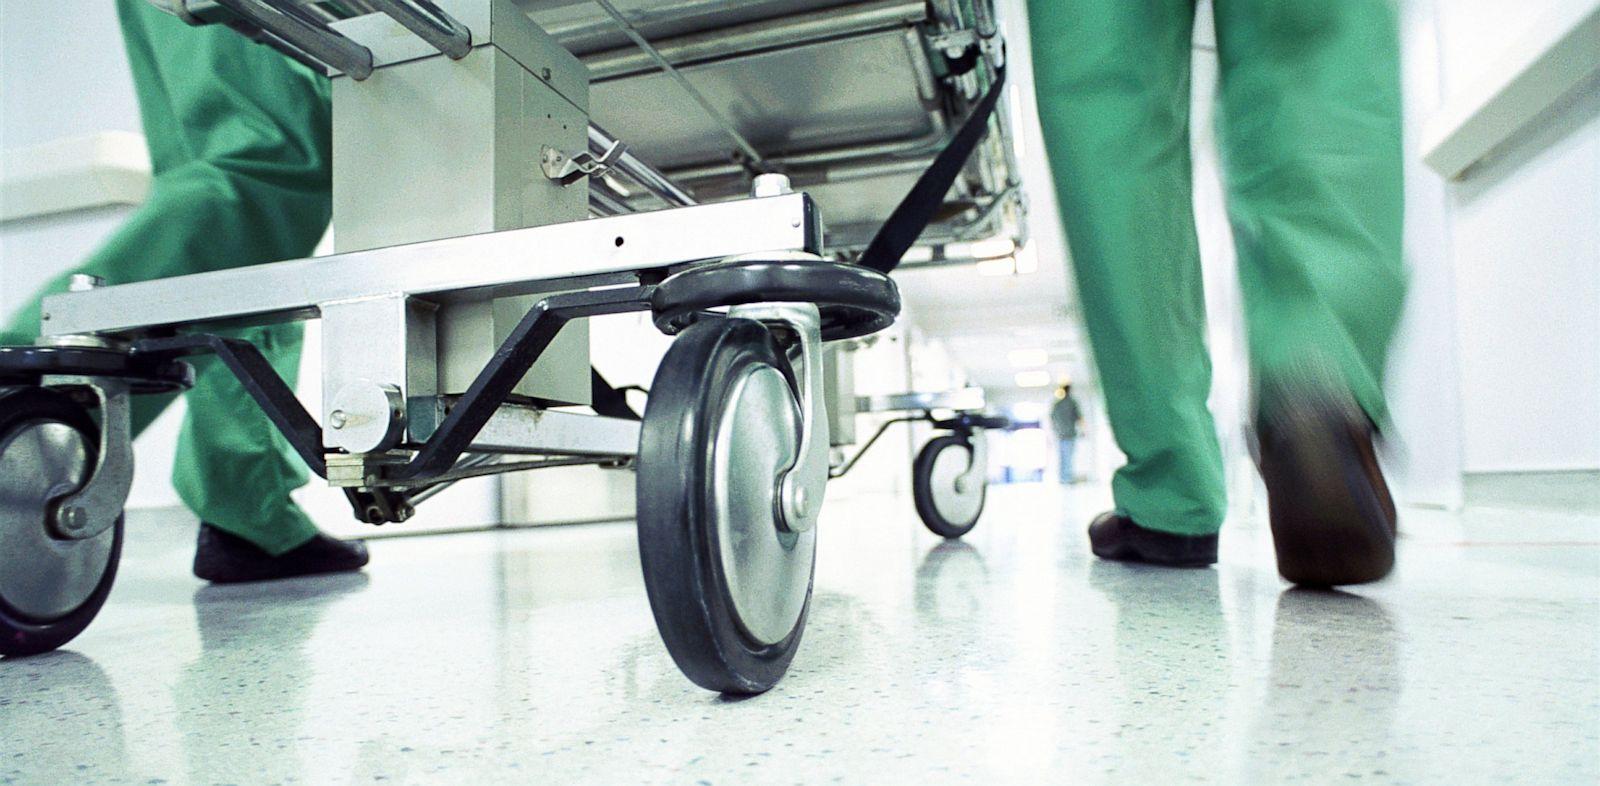 PHOTO: Gurney being rushed through hospital corridor.